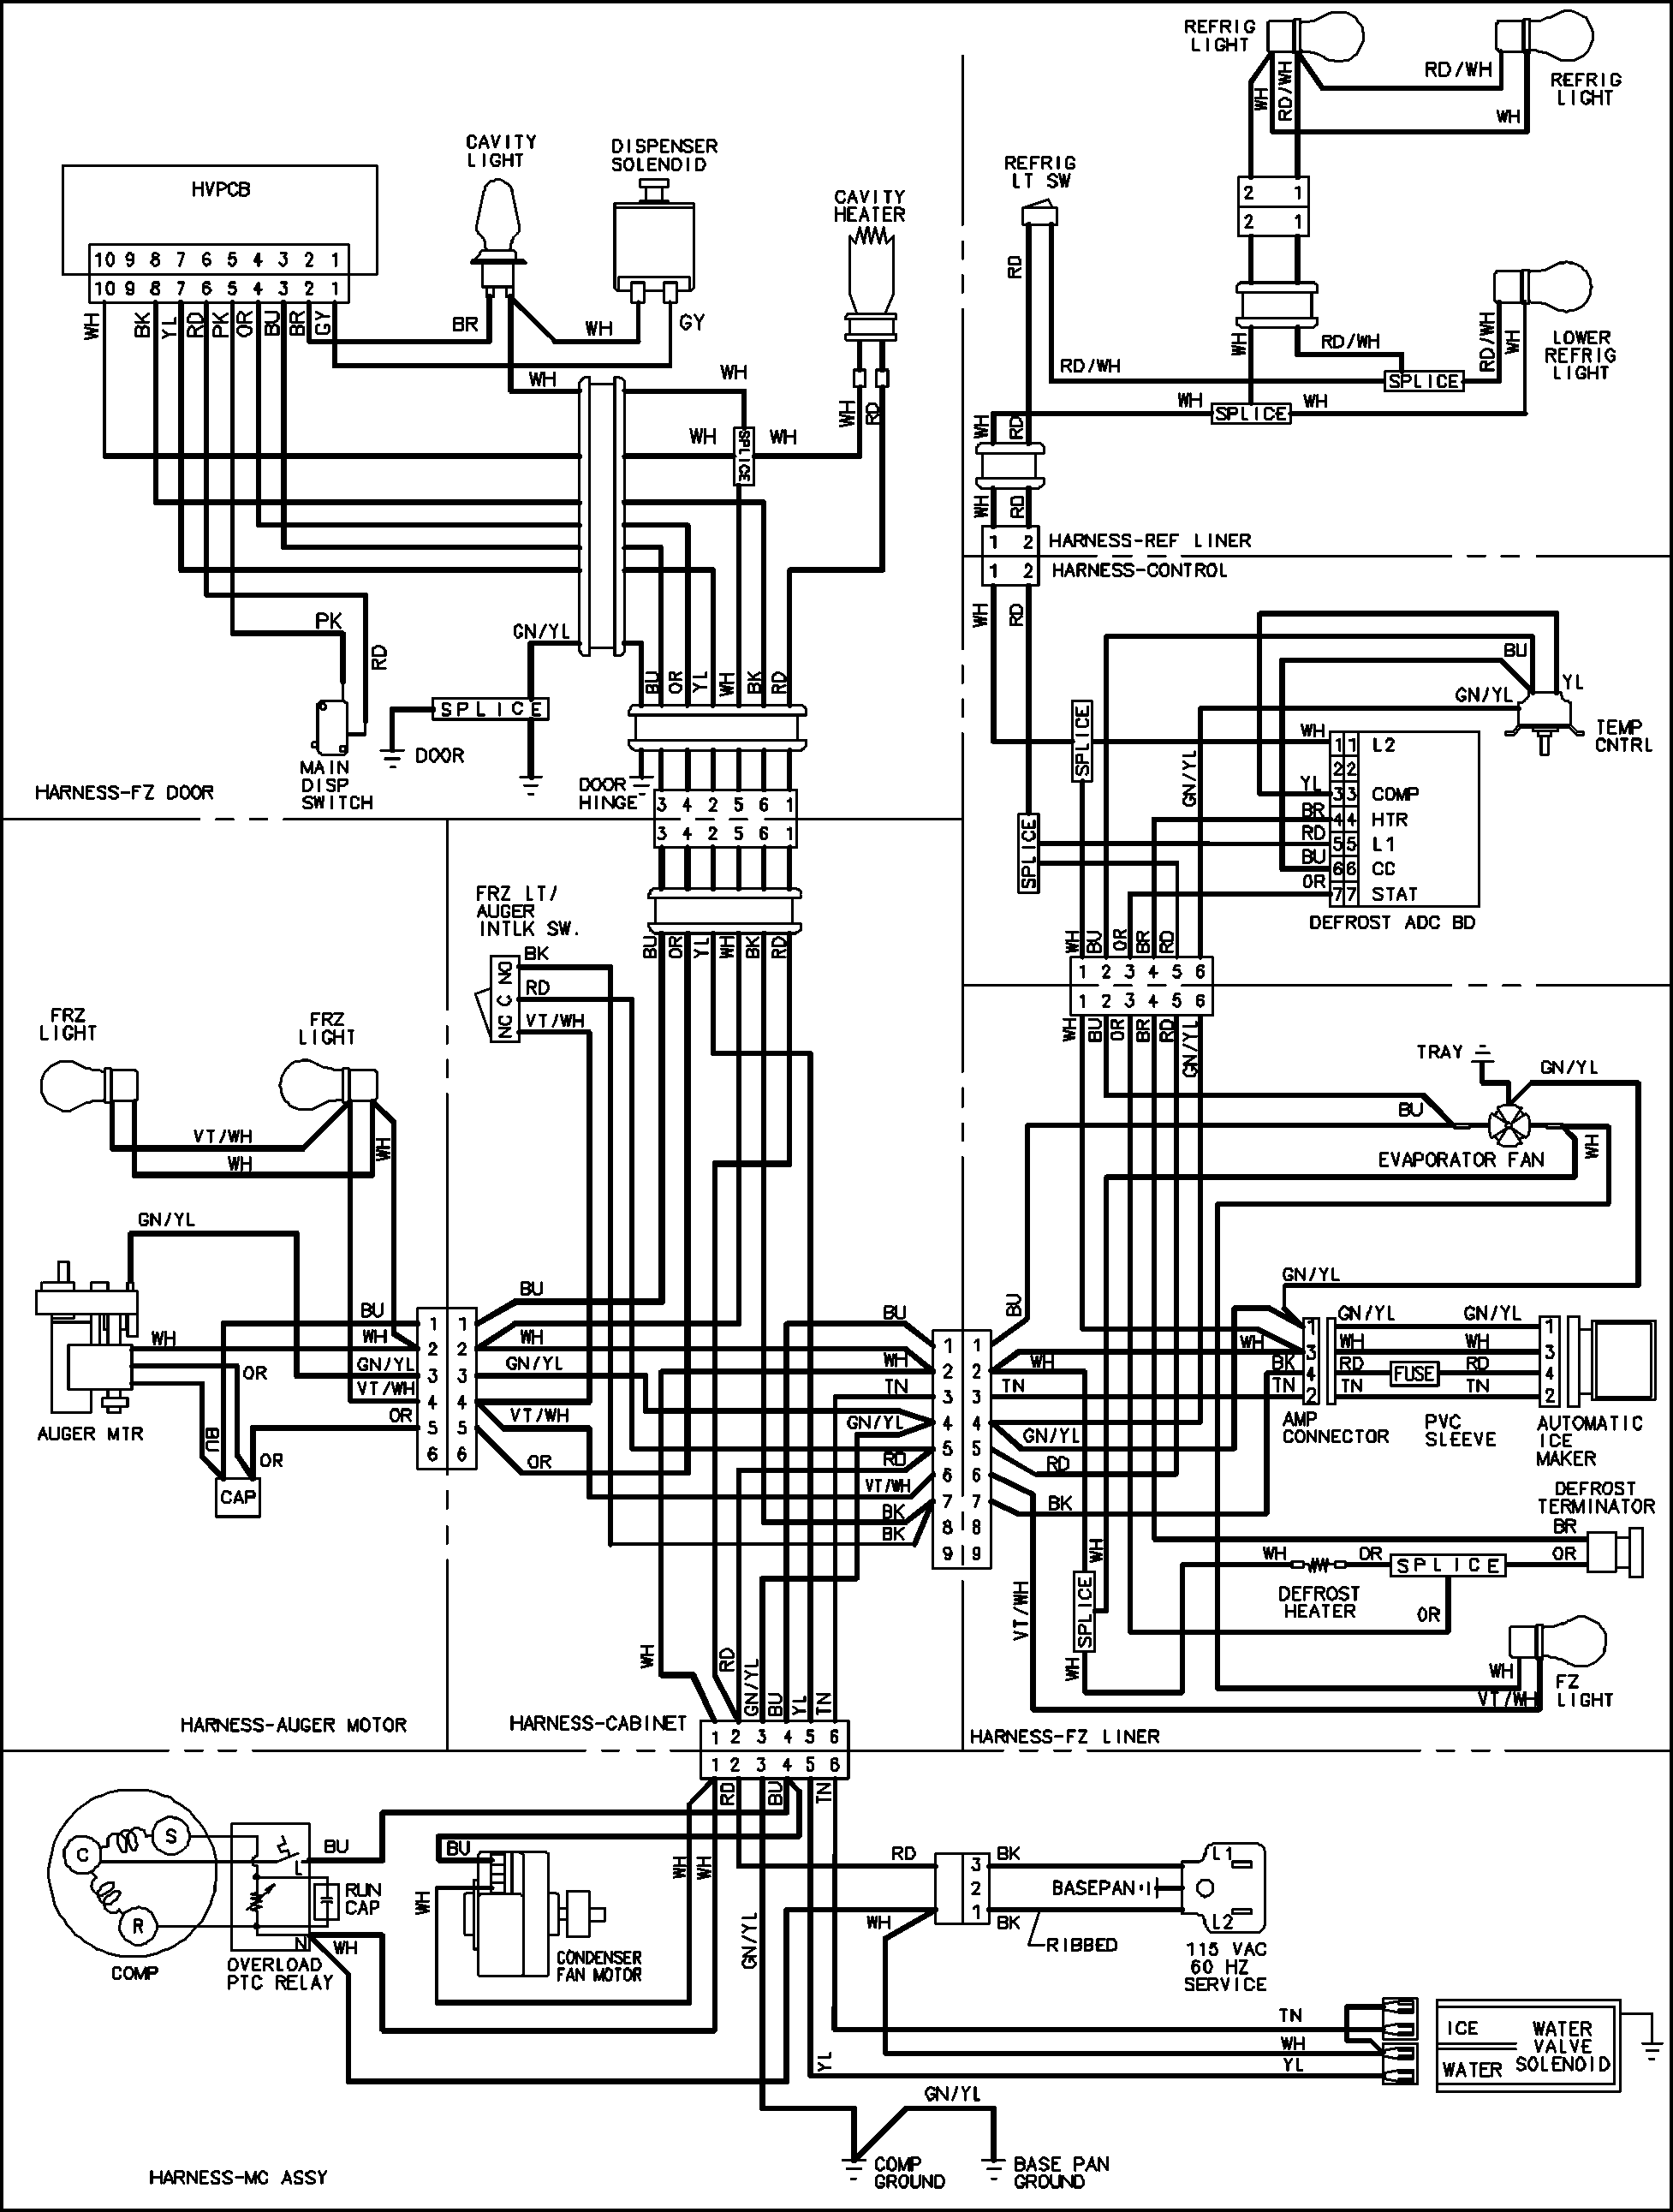 wiring diagram for hotpoint tumble dryer isuzu npr 200 white knight gibson